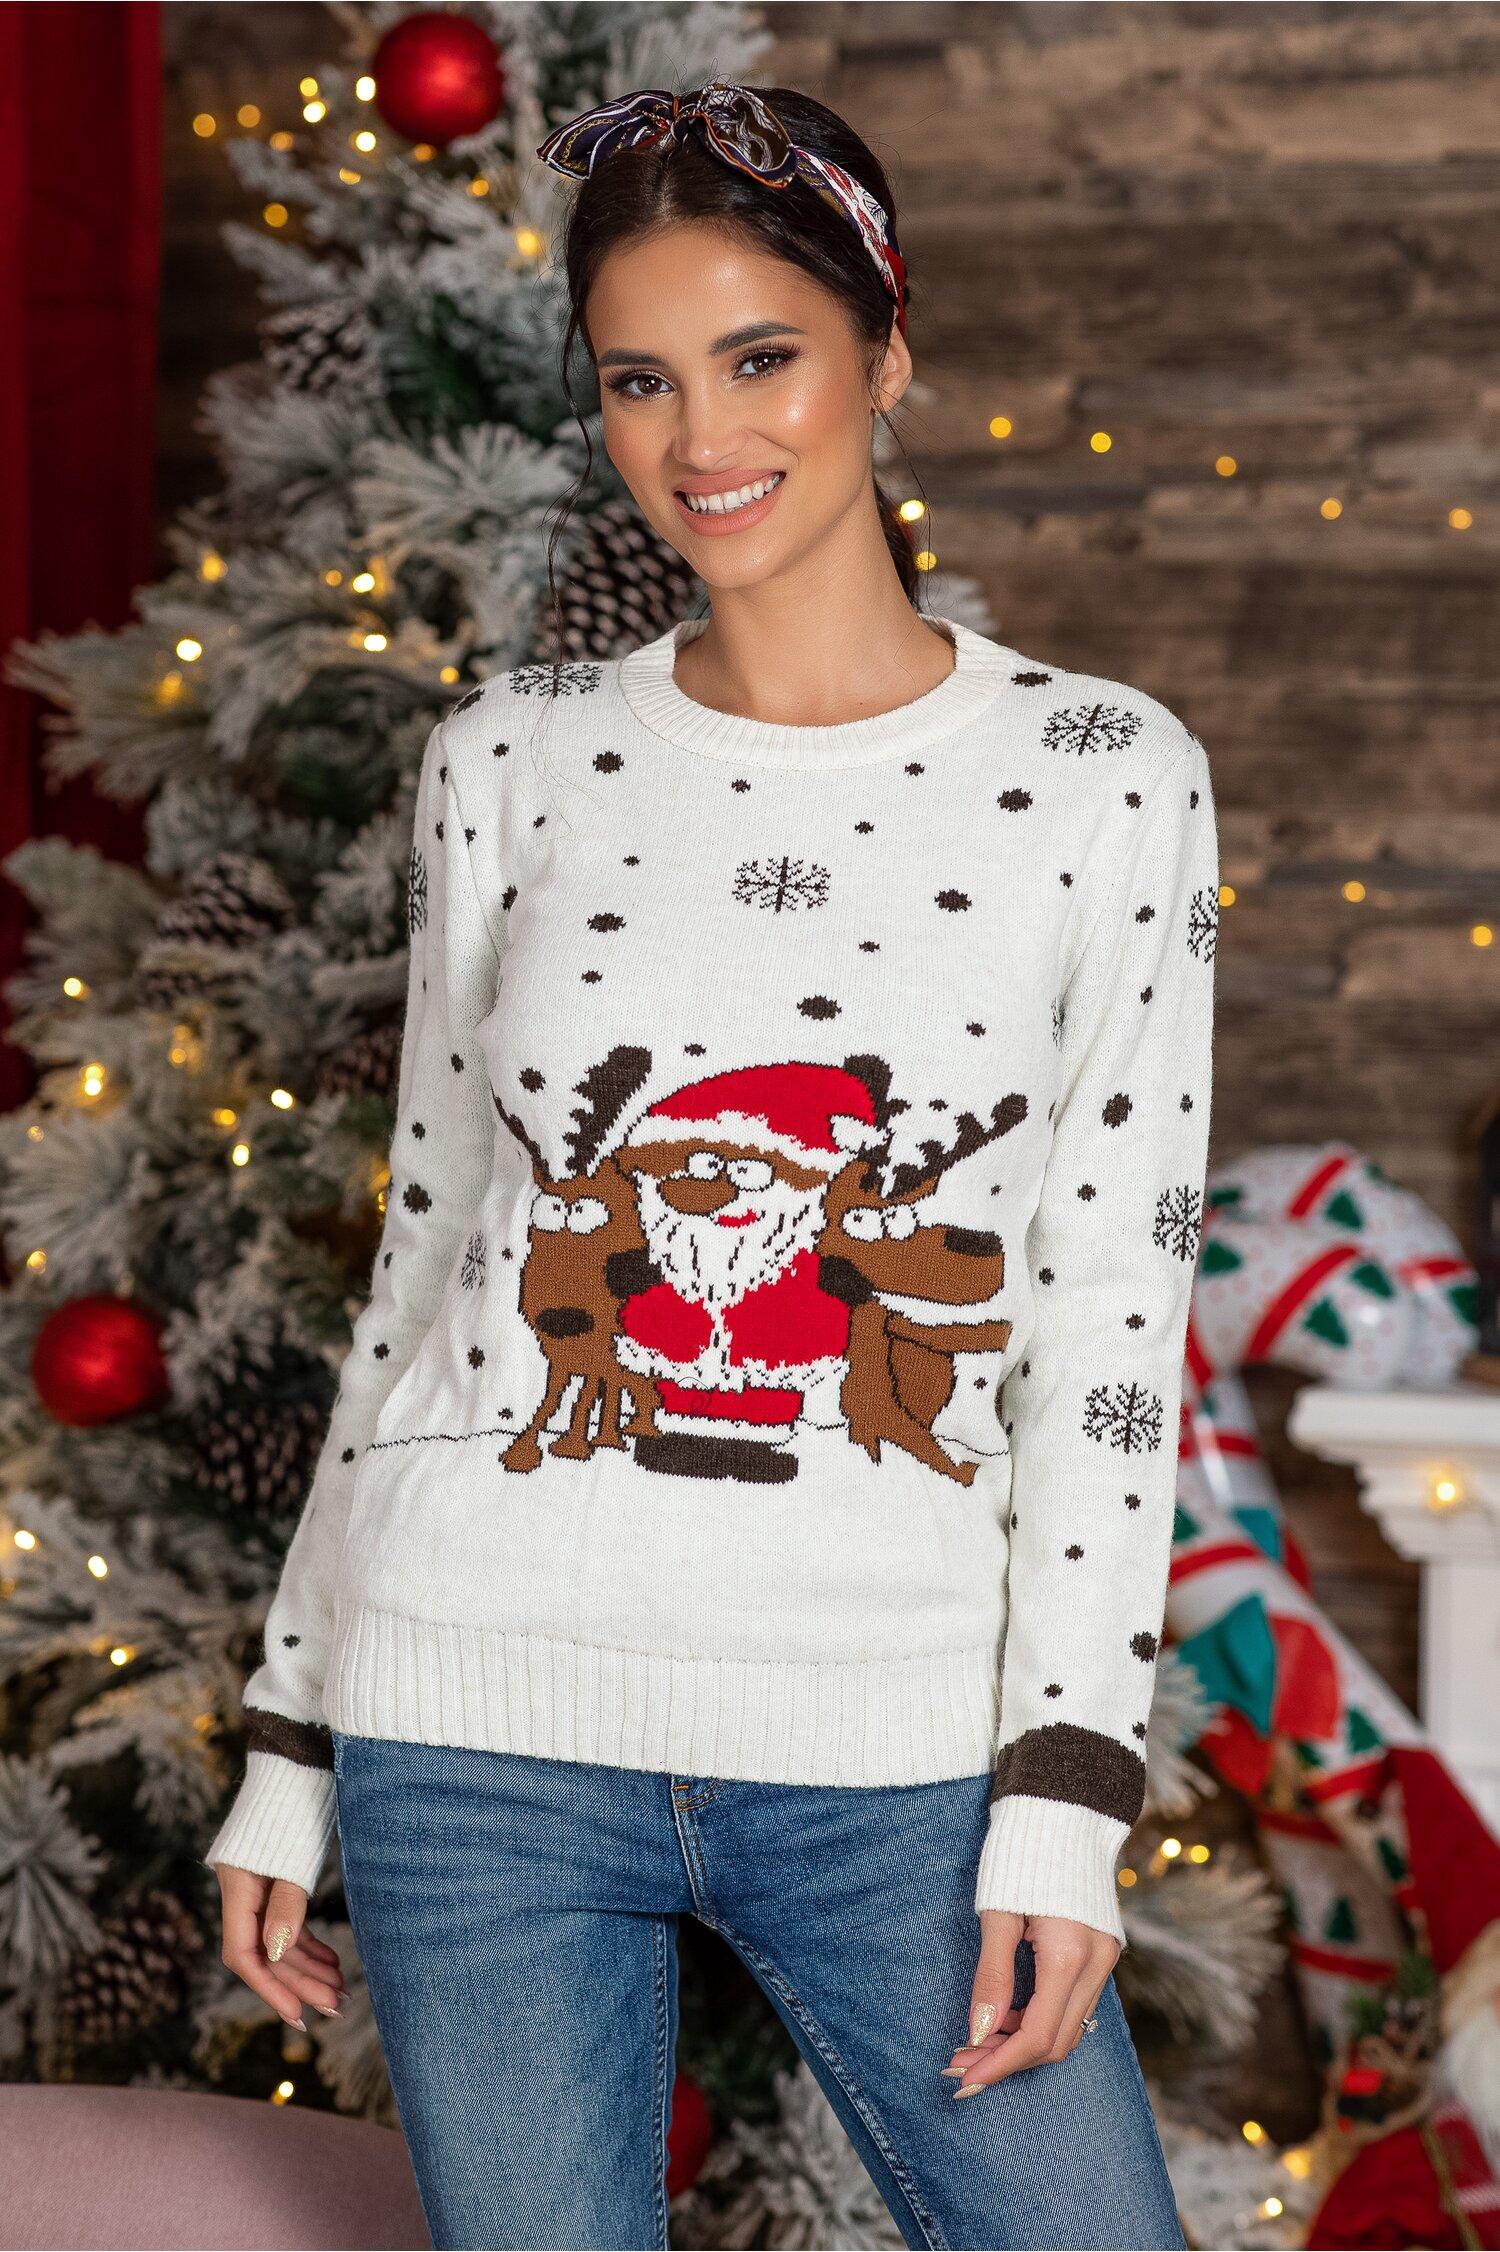 Bluza Holiday alba cu imprimeu de iarna Idei Cadouri de Craciun Online